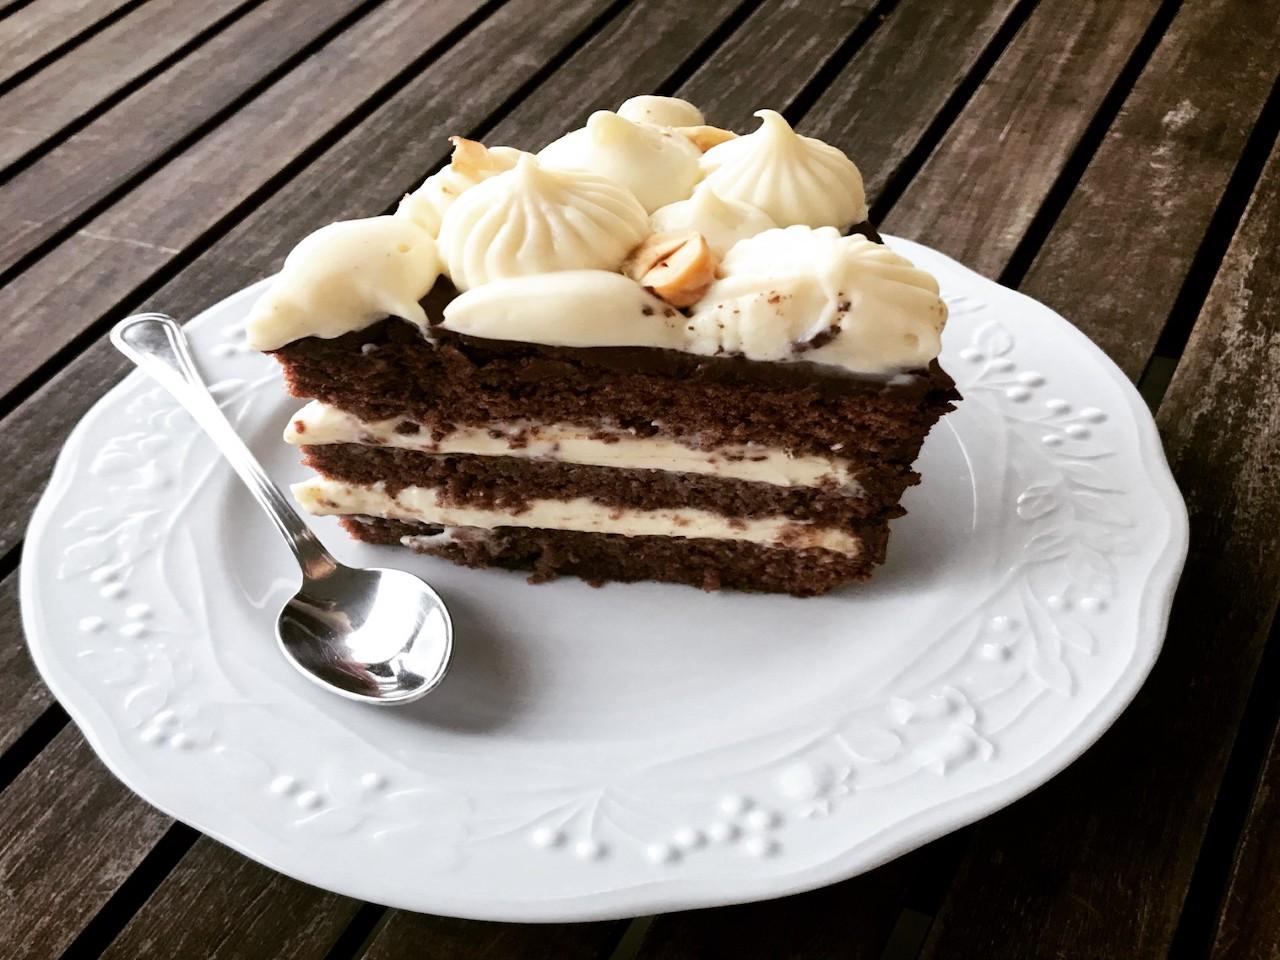 Pan di spagna al cacao e namelaka alla vaniglia